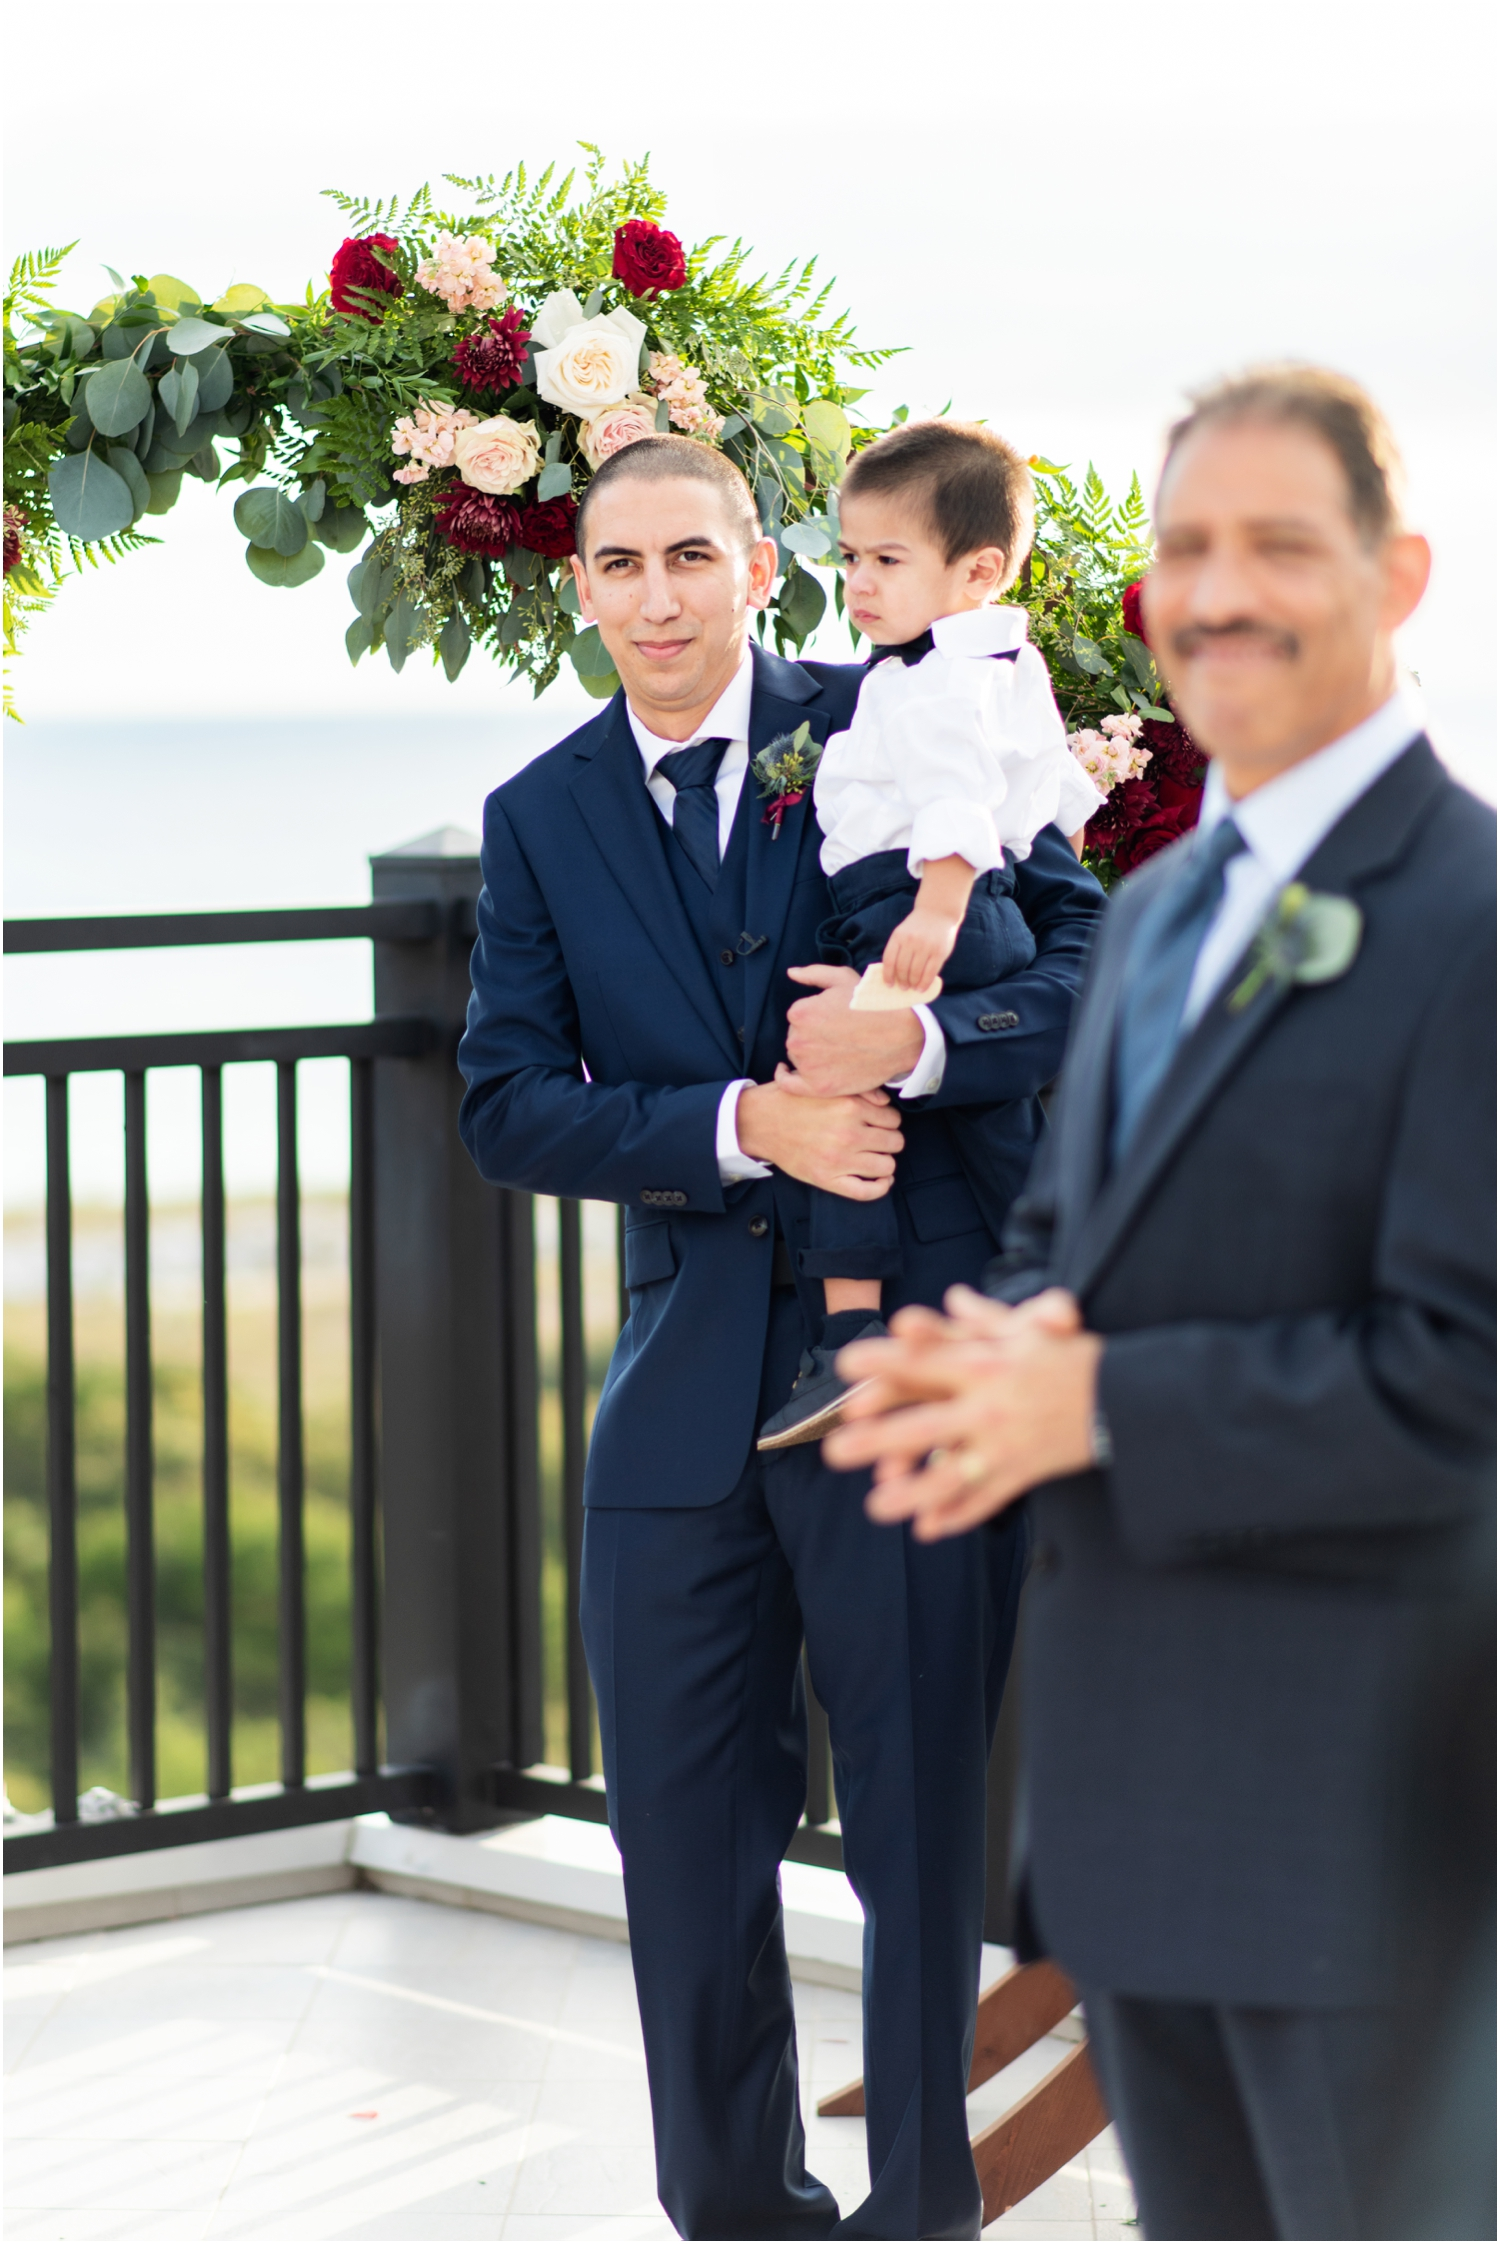 Henderson Beach Resort Inn Destin Florida Wedding Photographer rooftop ceremony first look